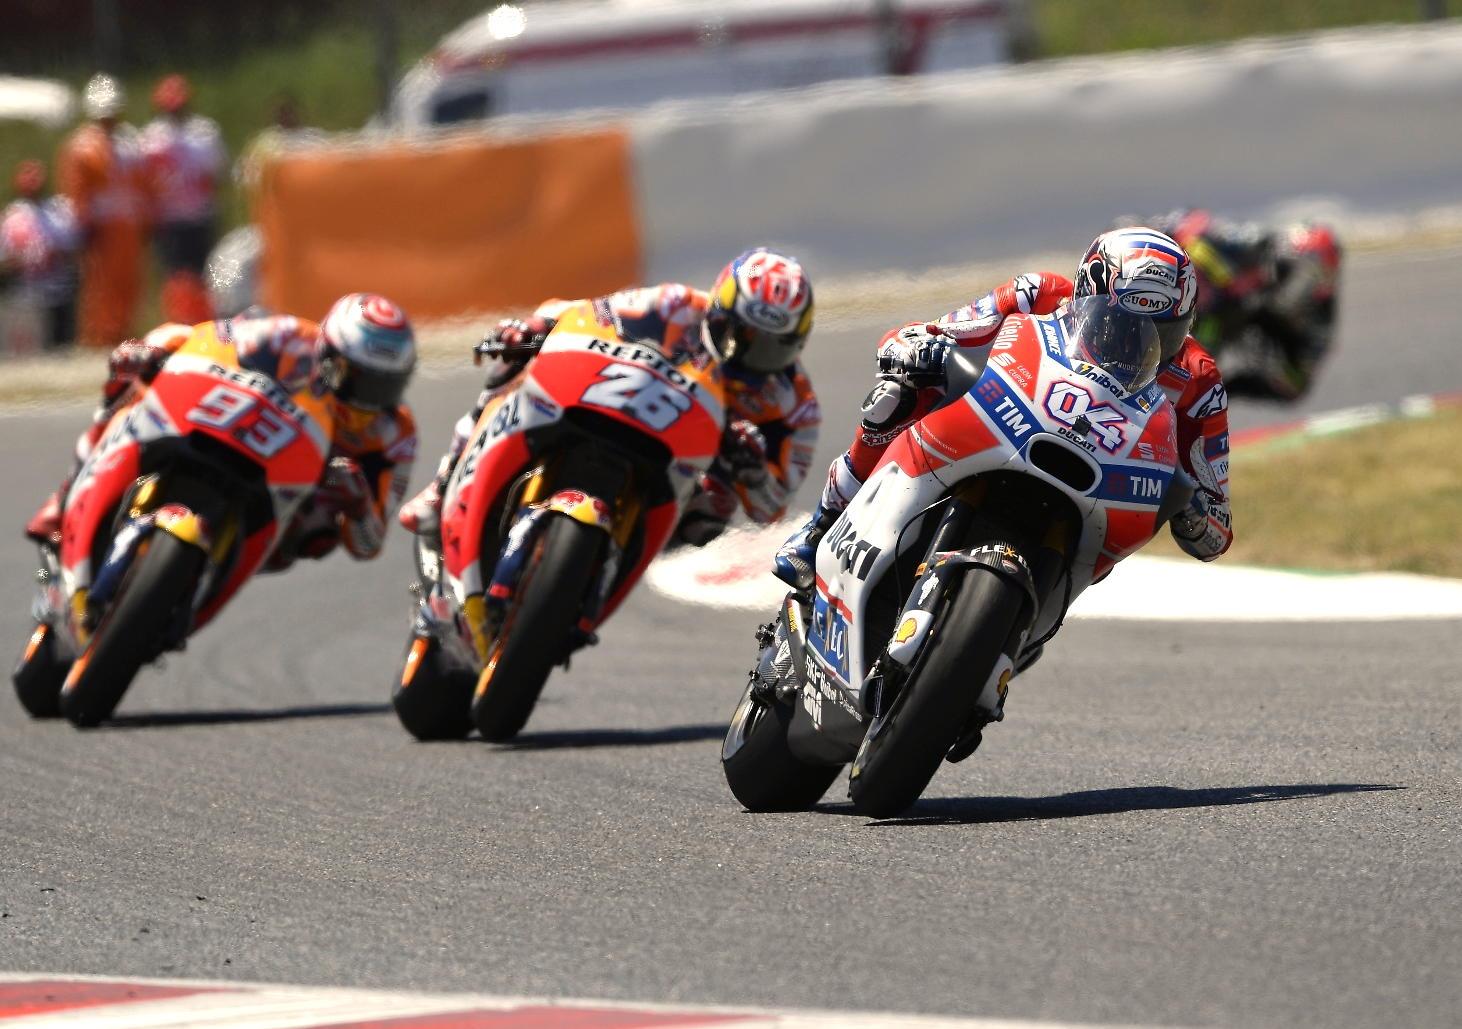 Motogp Motorcycle Racing